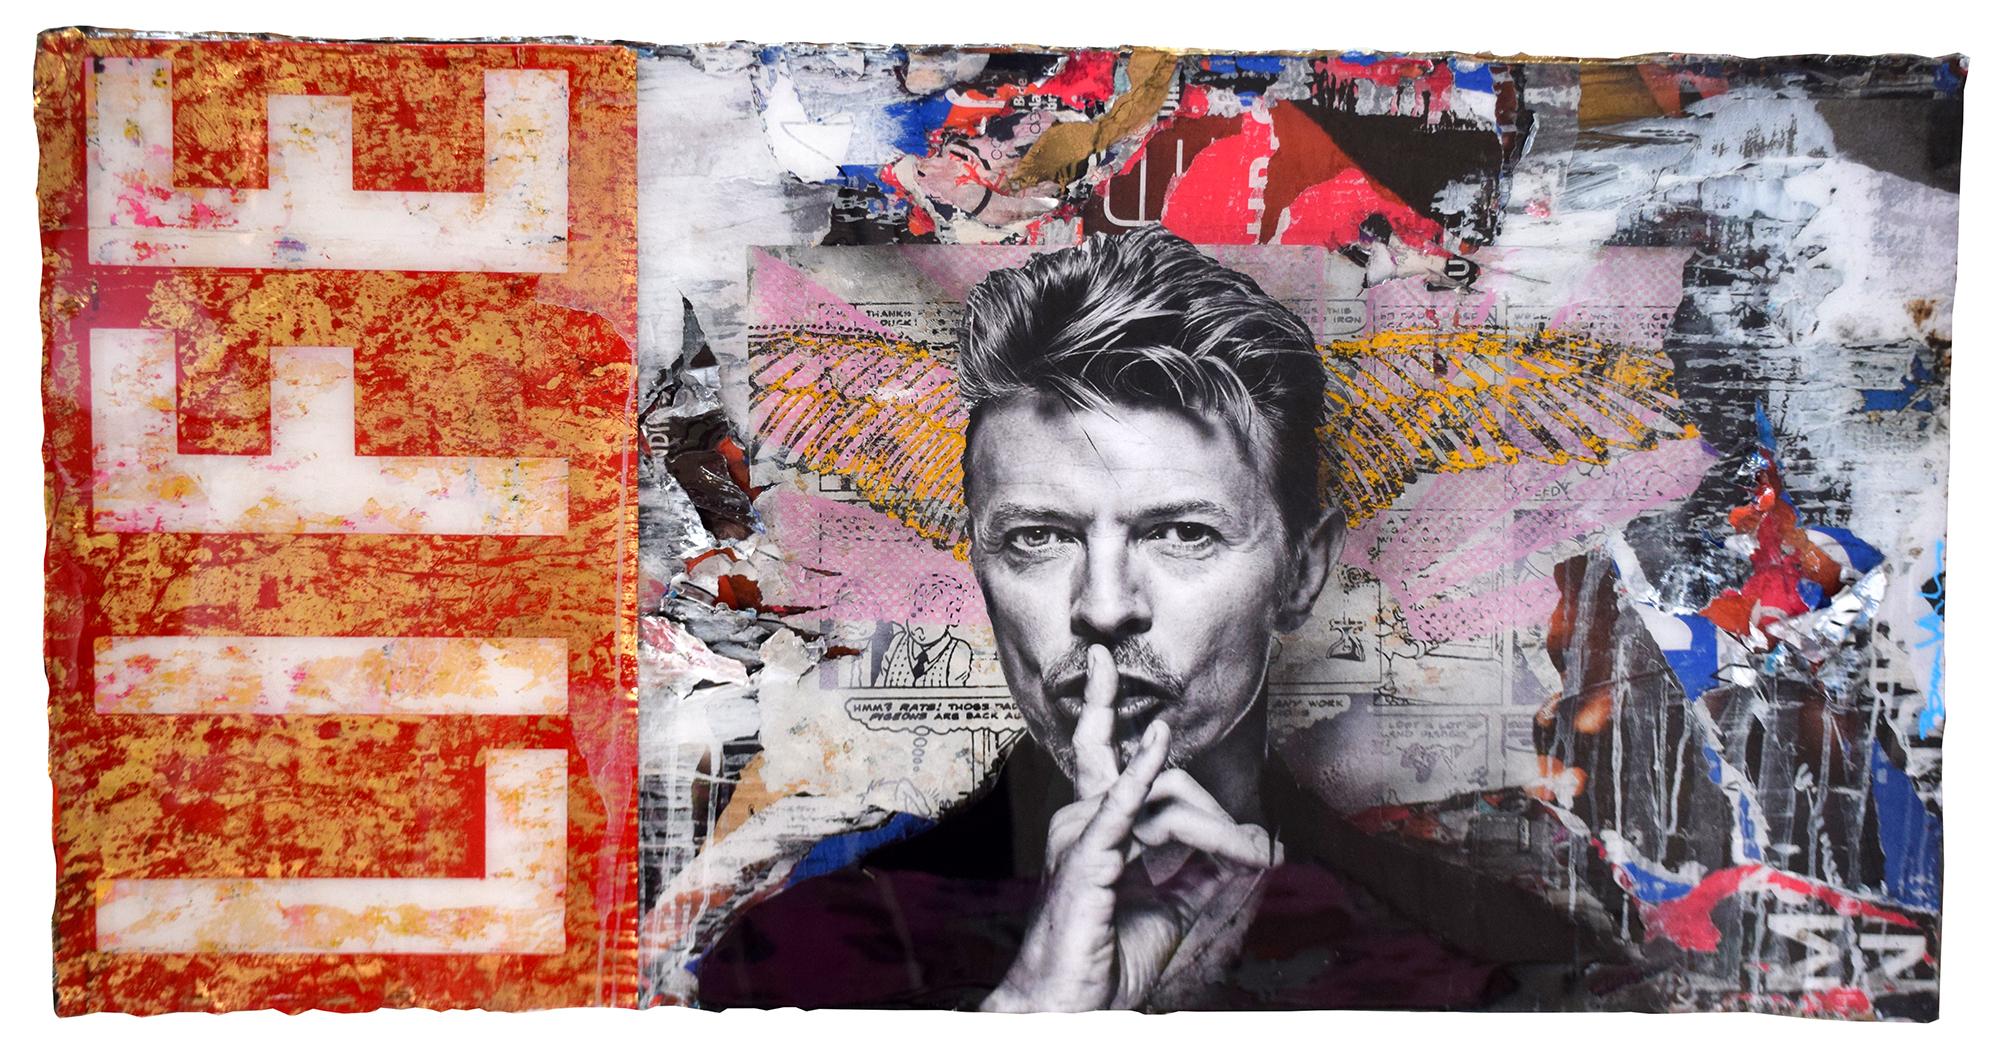 Bram Reijnders - Bowie (LIFE) , 8031-012-037